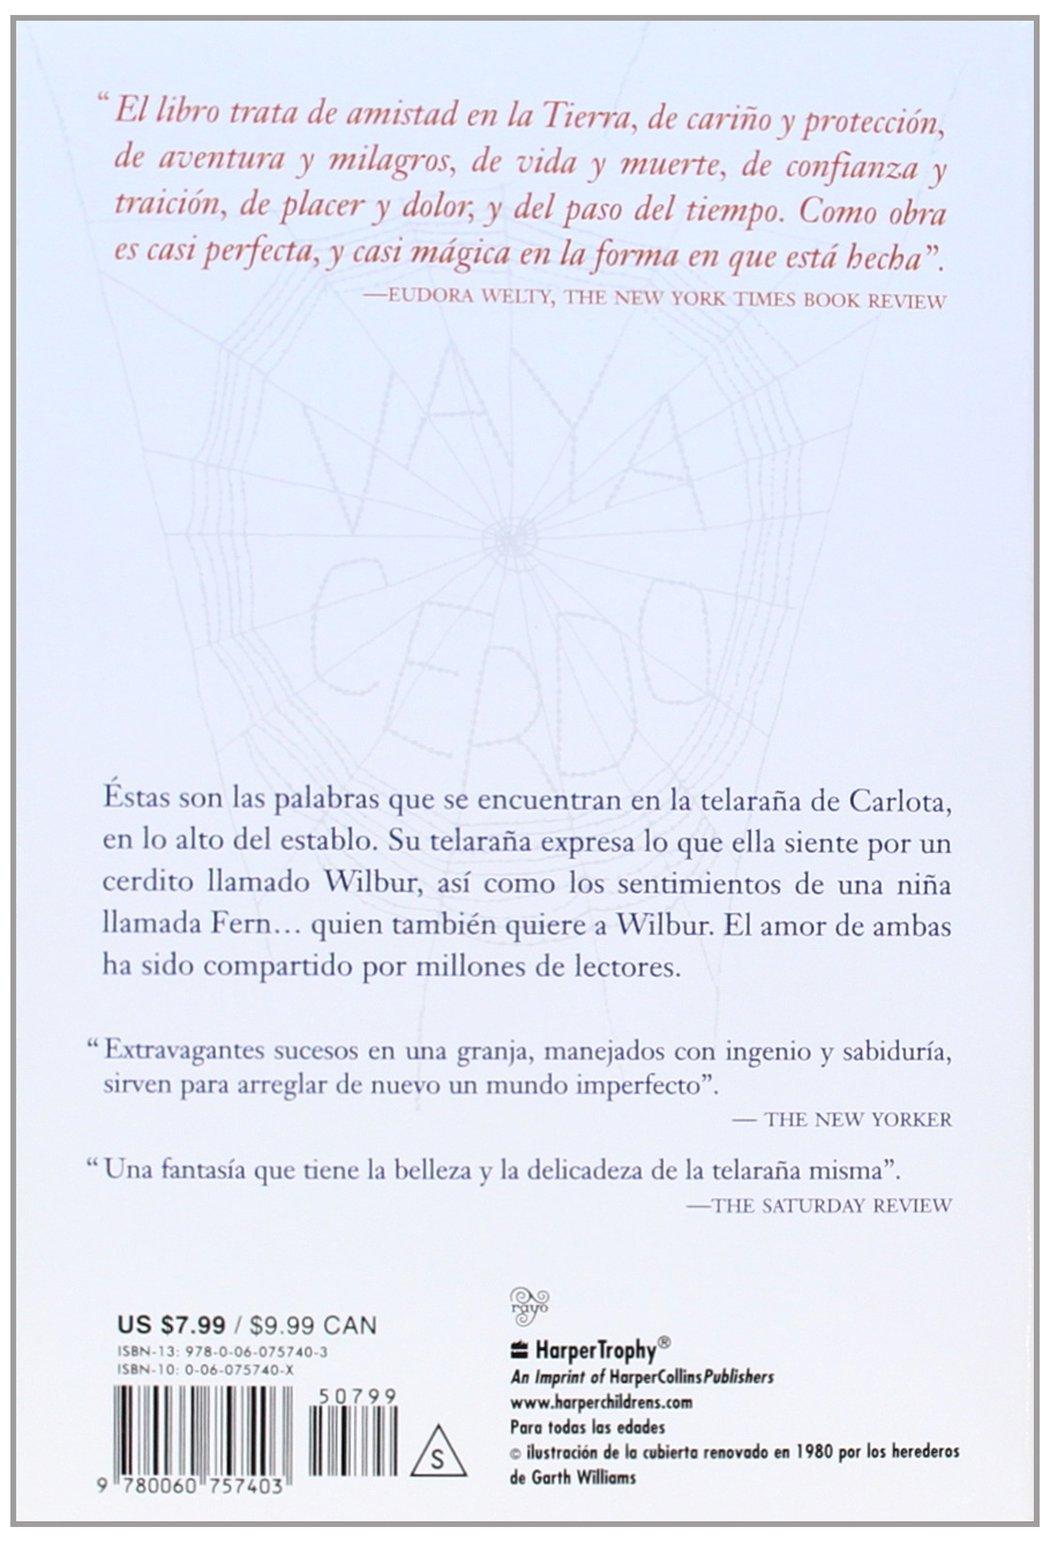 La Telaraña De Carlota Spanish Edition E B White Garth - Que es us zip code